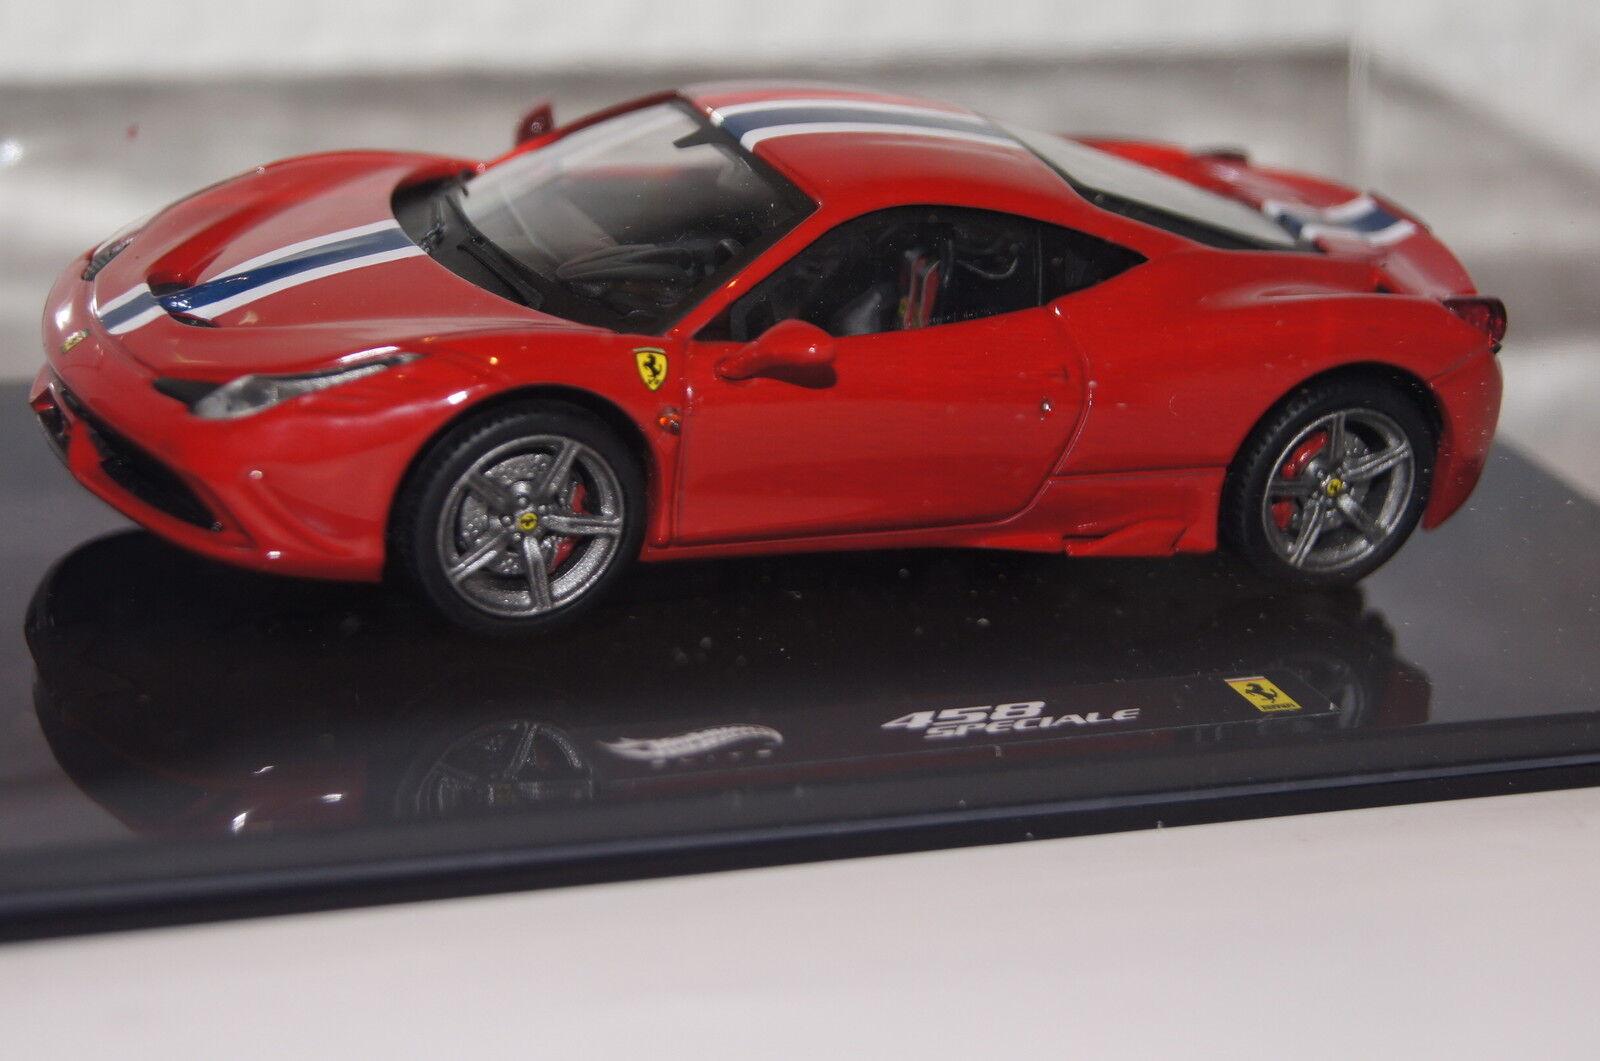 Ferrari 458 Speciale red 1 43 Hot Wheels neu & OVP BLY45